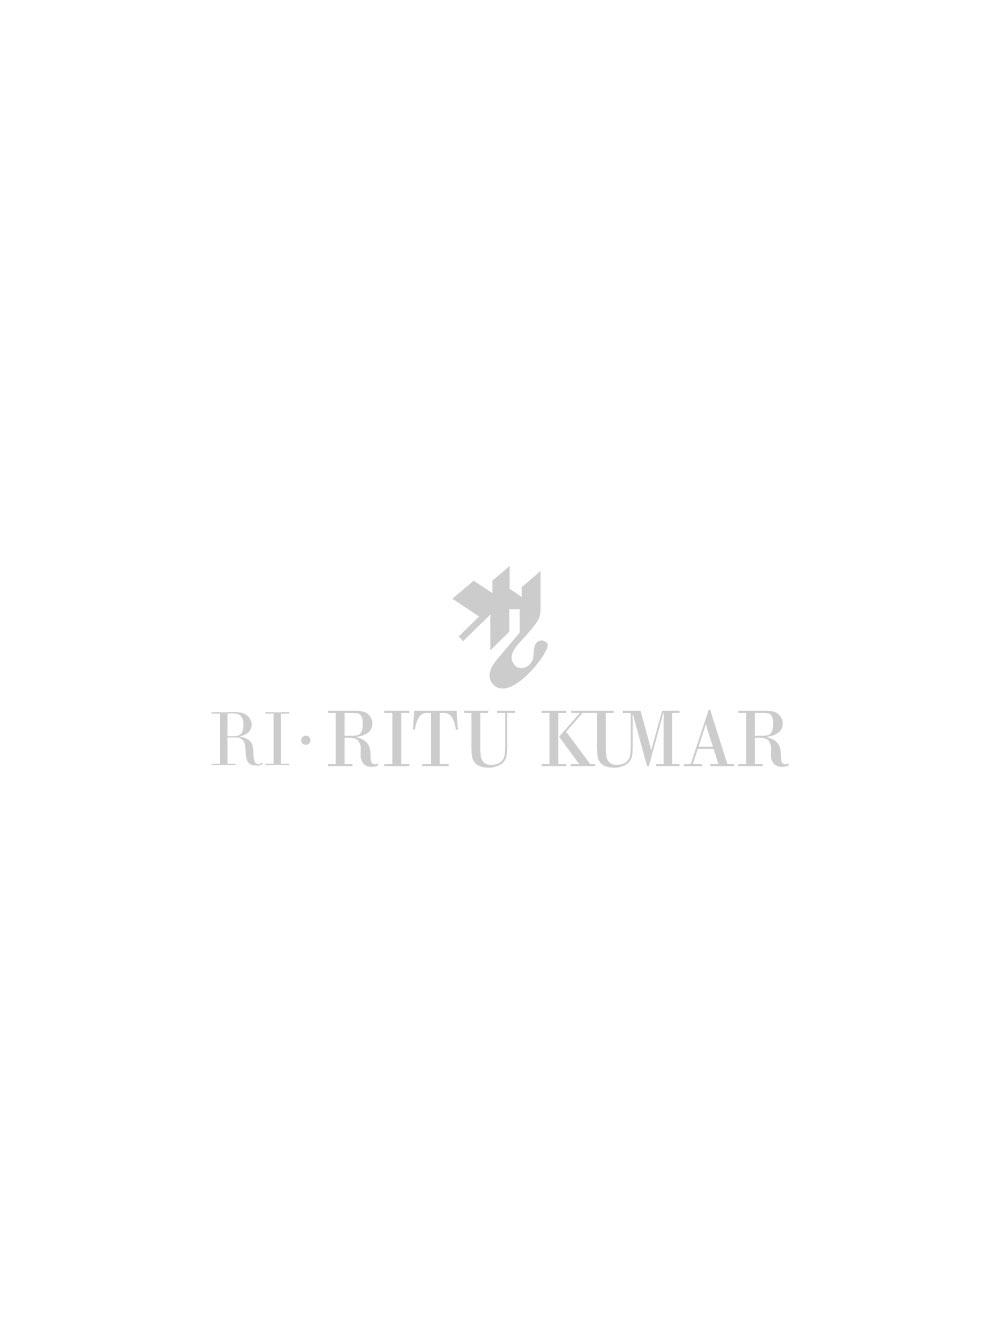 Turquoise Embroidered Jacket Style Kurta With Dupatta And Churidar